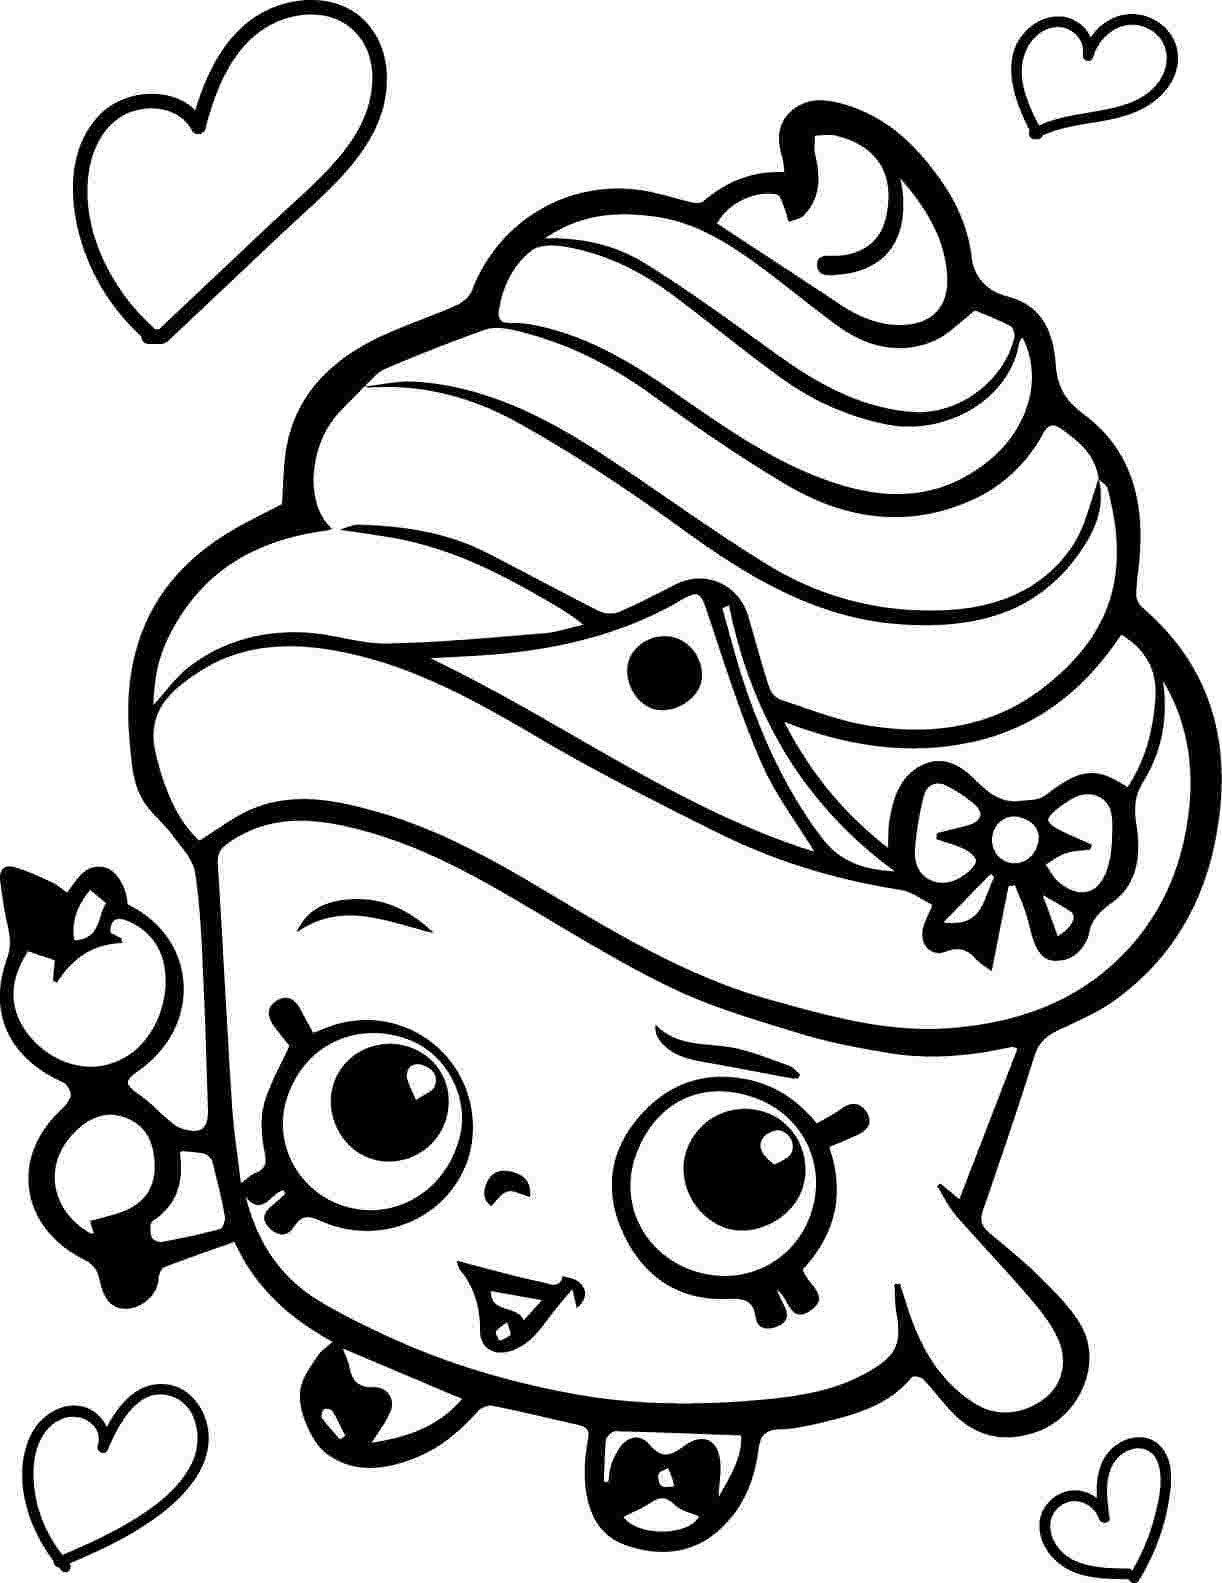 Shopkins Birthday Cake Coloring Pages Shopkins Coloring Pages Cupcake Ex In 2020 Shopkin Coloring Pages Shopkins Colouring Pages Shopkins Coloring Pages Free Printable